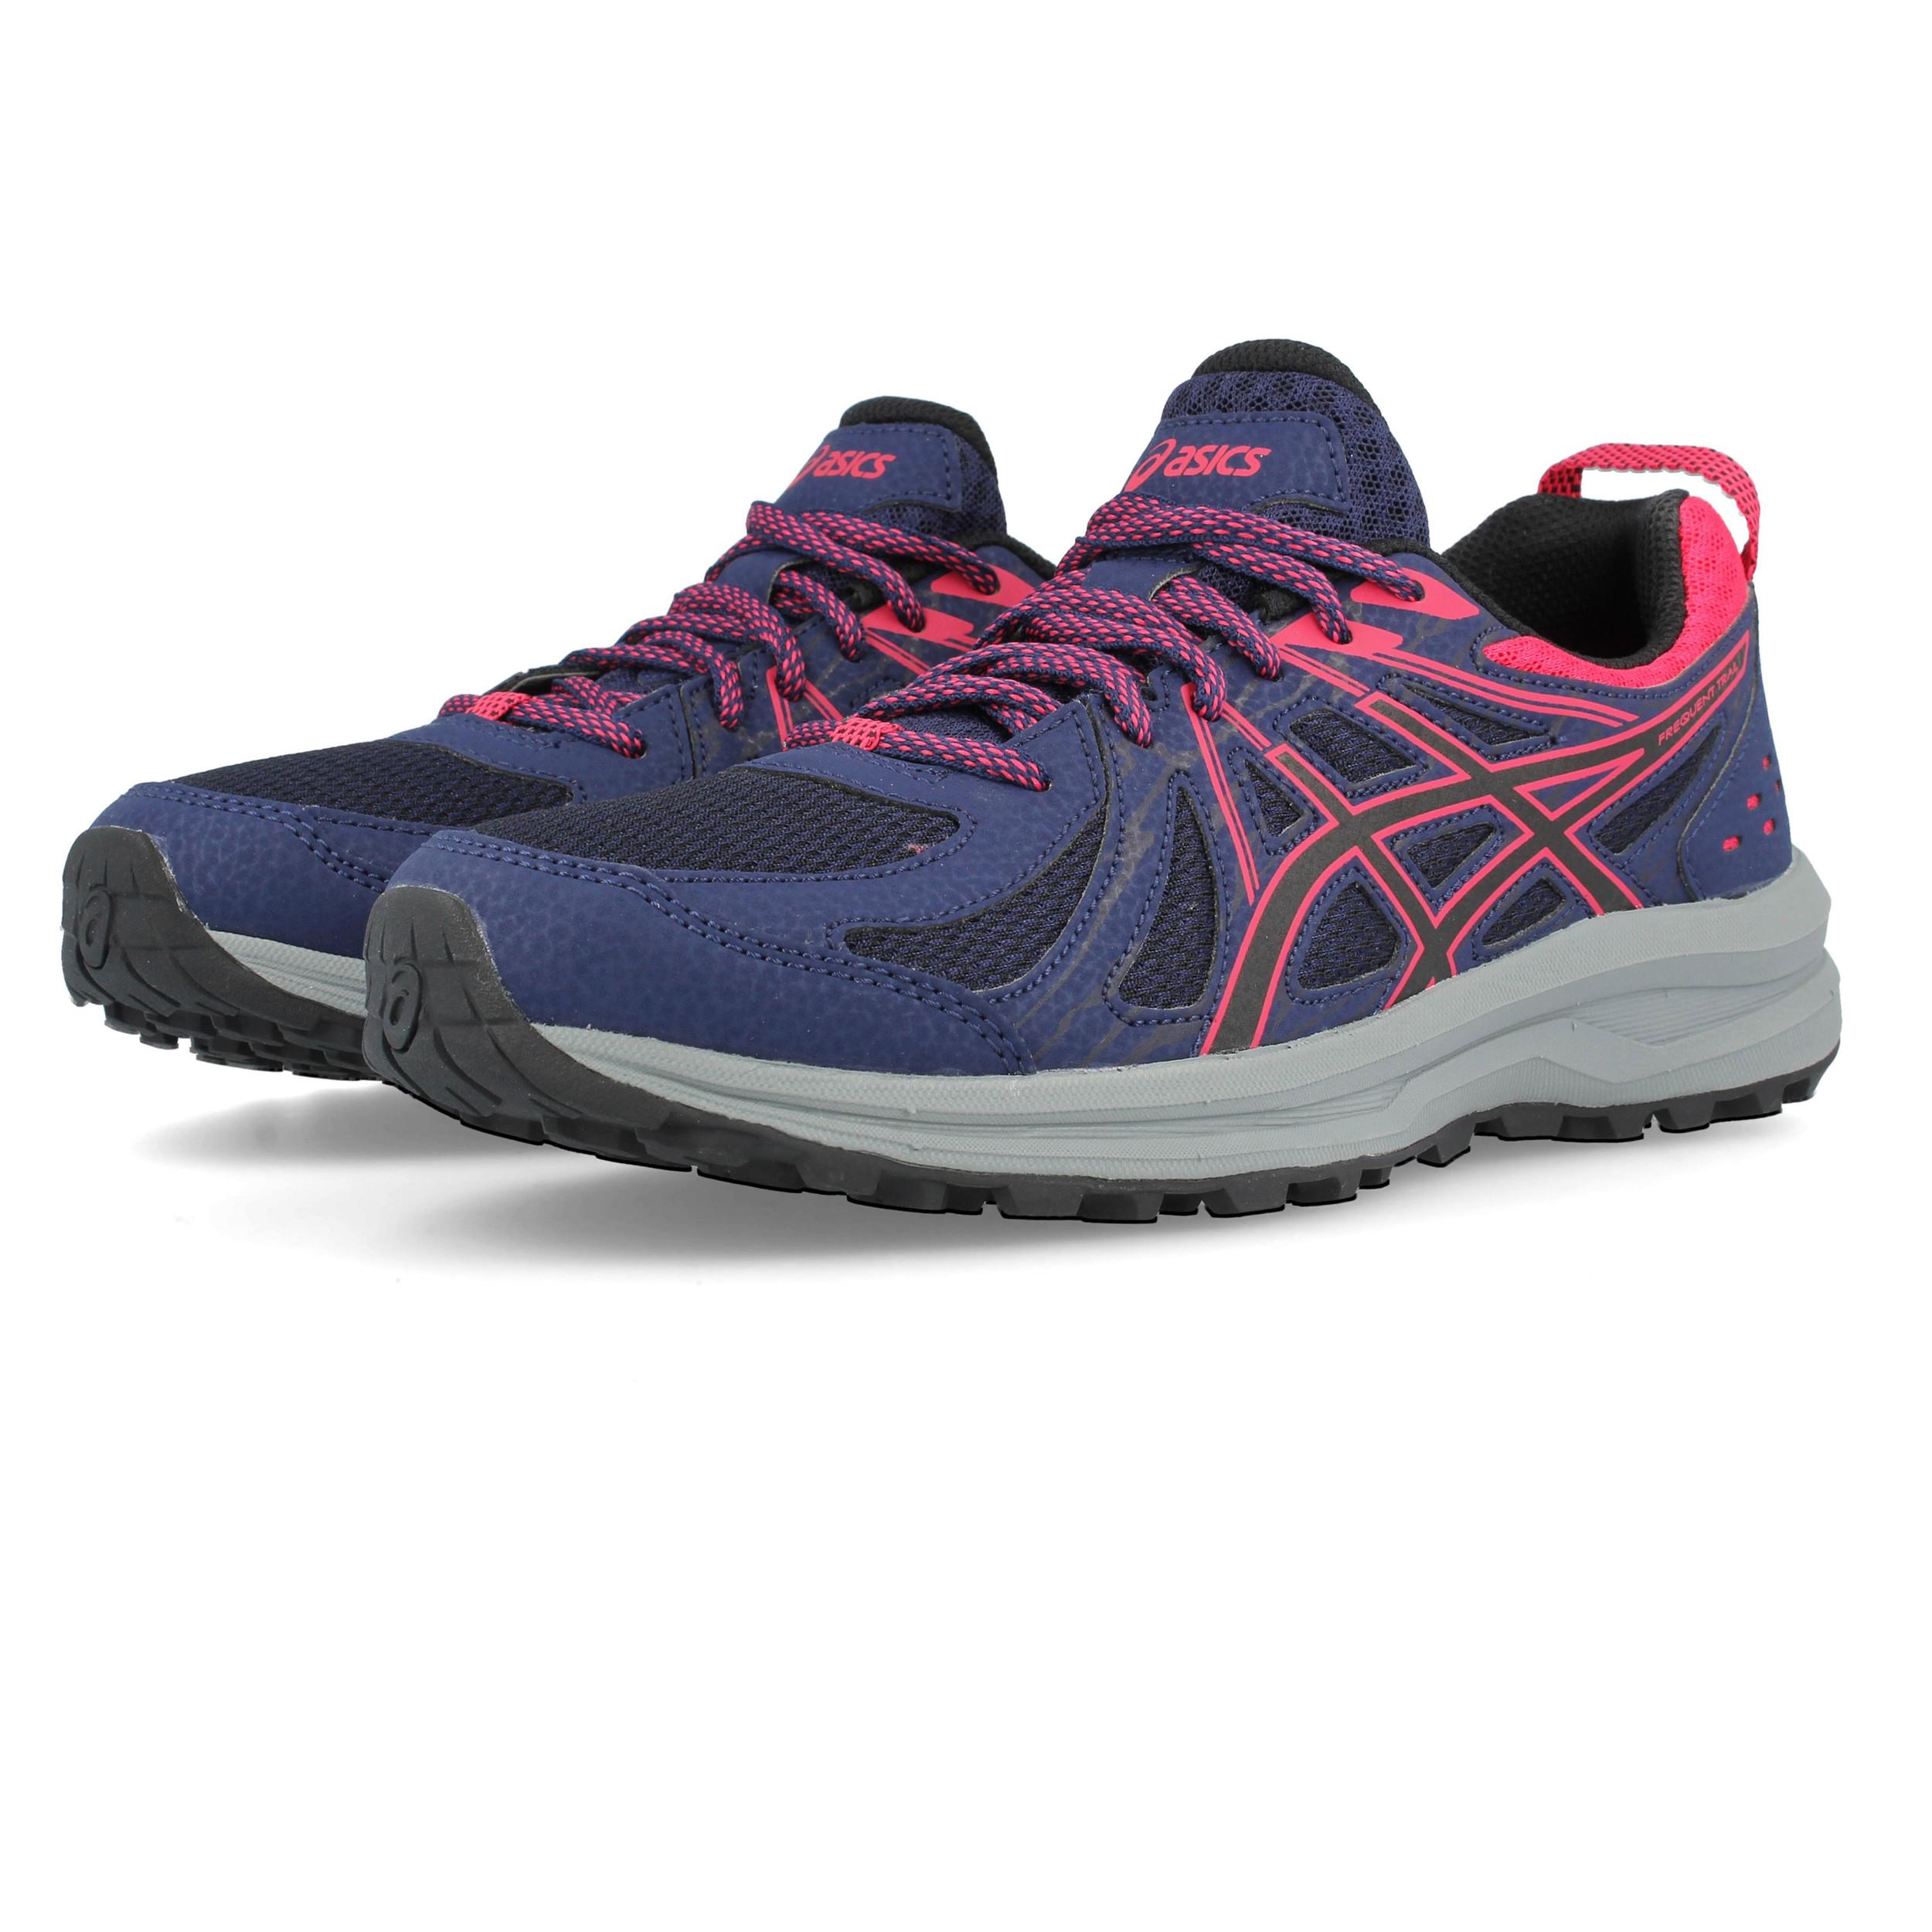 Scarpe Frequent Da Su Sneakers Corsa Asics Donna Xt Dettagli Blu Trail Ginnastica Sport 3RjS5A4Lqc